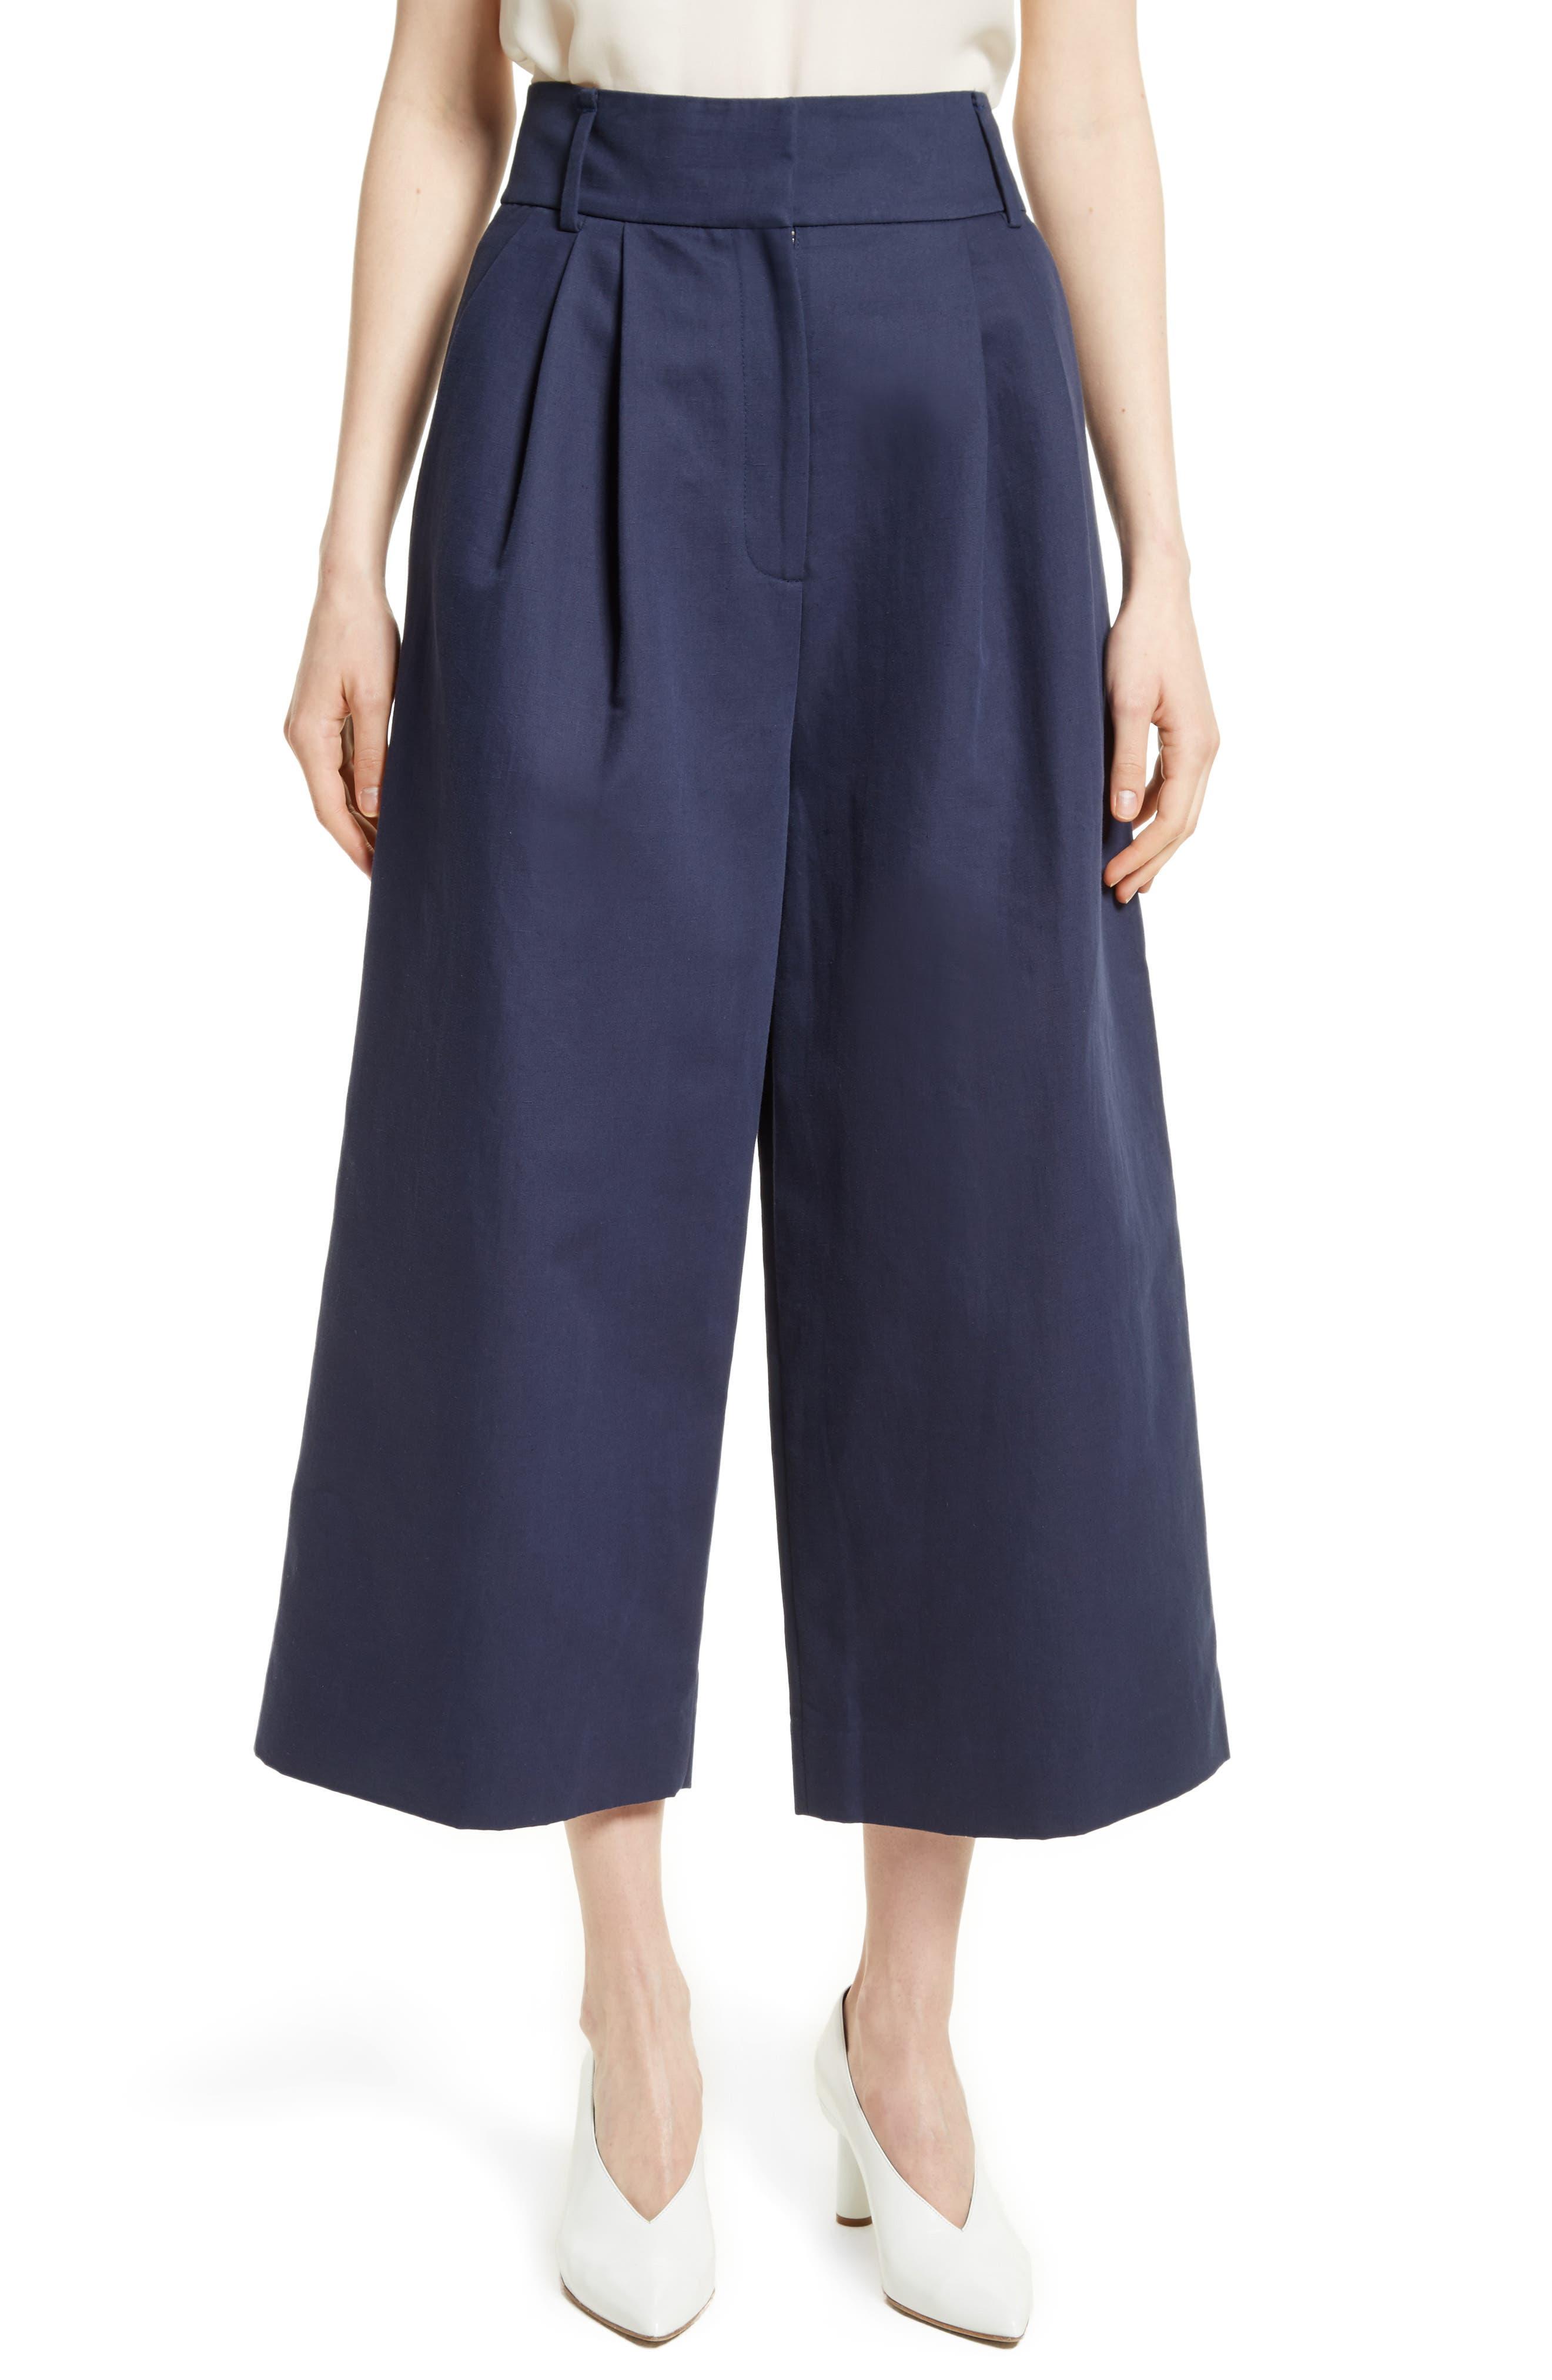 Alternate Image 1 Selected - Tibi Chassis Plain Weave Crop Pants